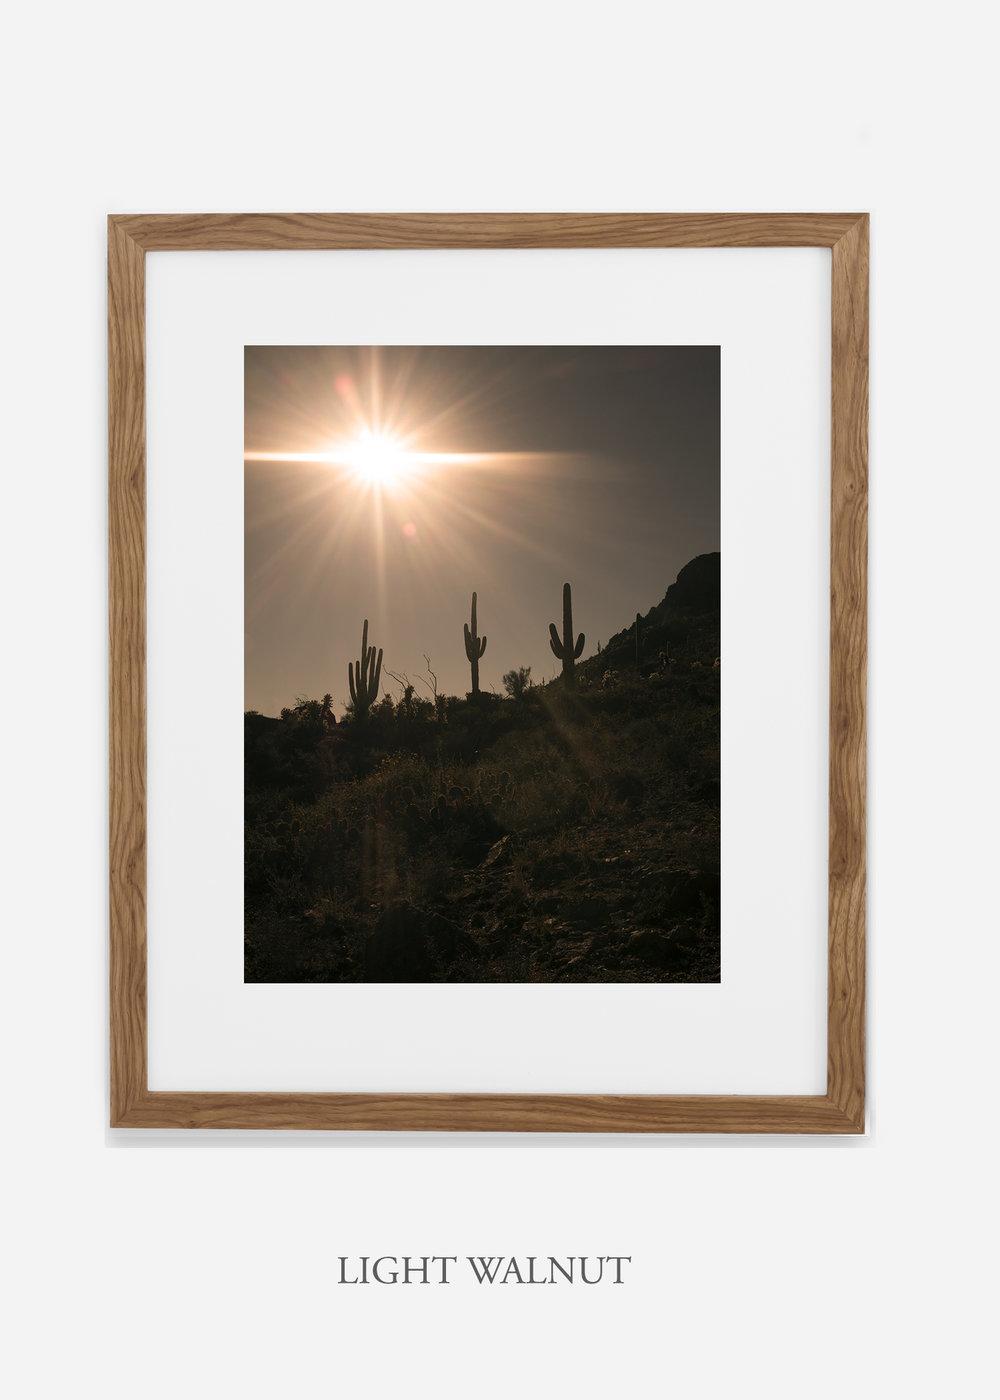 lightwalnutframe-saguaroNo.16-wildercalifornia-art-wallart-cactusprint-homedecor-prints-arizona-botanical-artwork-interiordesign.jpg